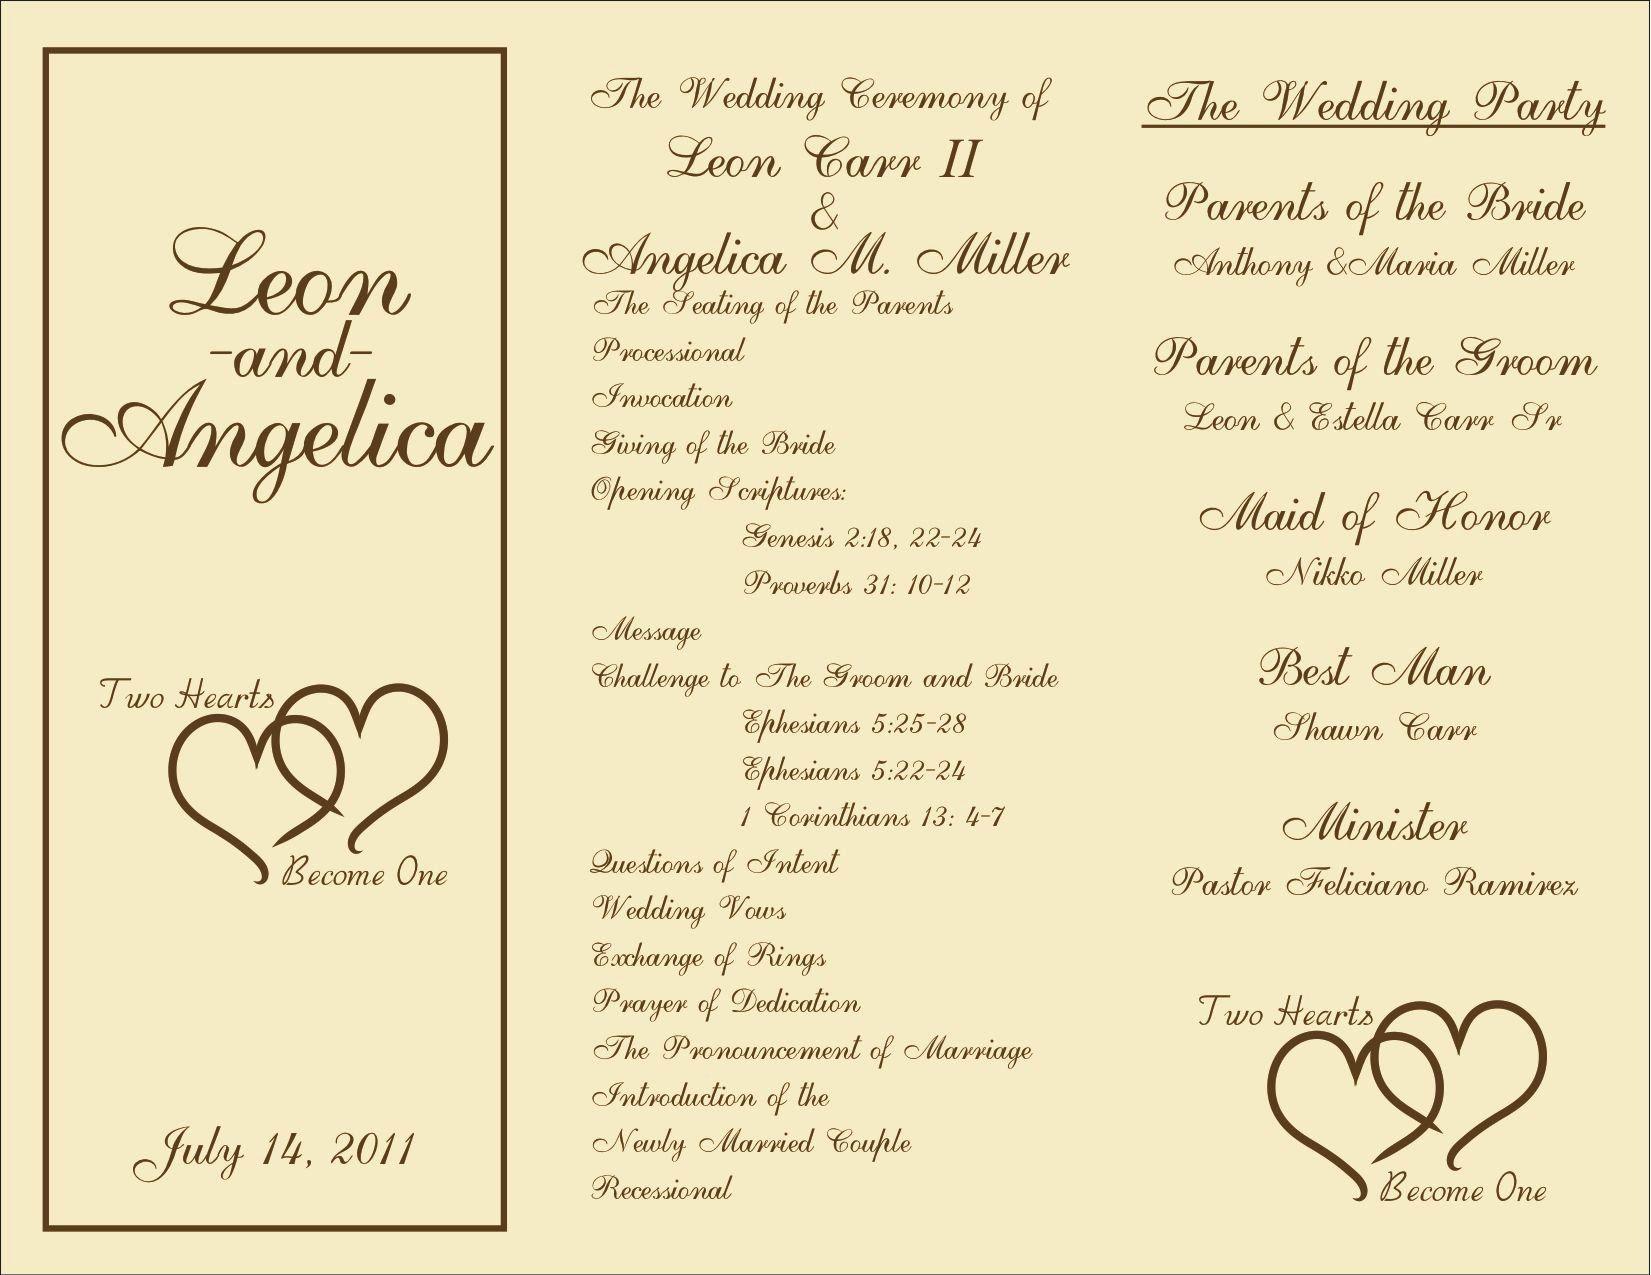 Wedding Reception Programme Template Best Of Free Printable Wedding Programs In 2020 Wedding Program Template Free Wedding Programs Template Wedding Reception Program